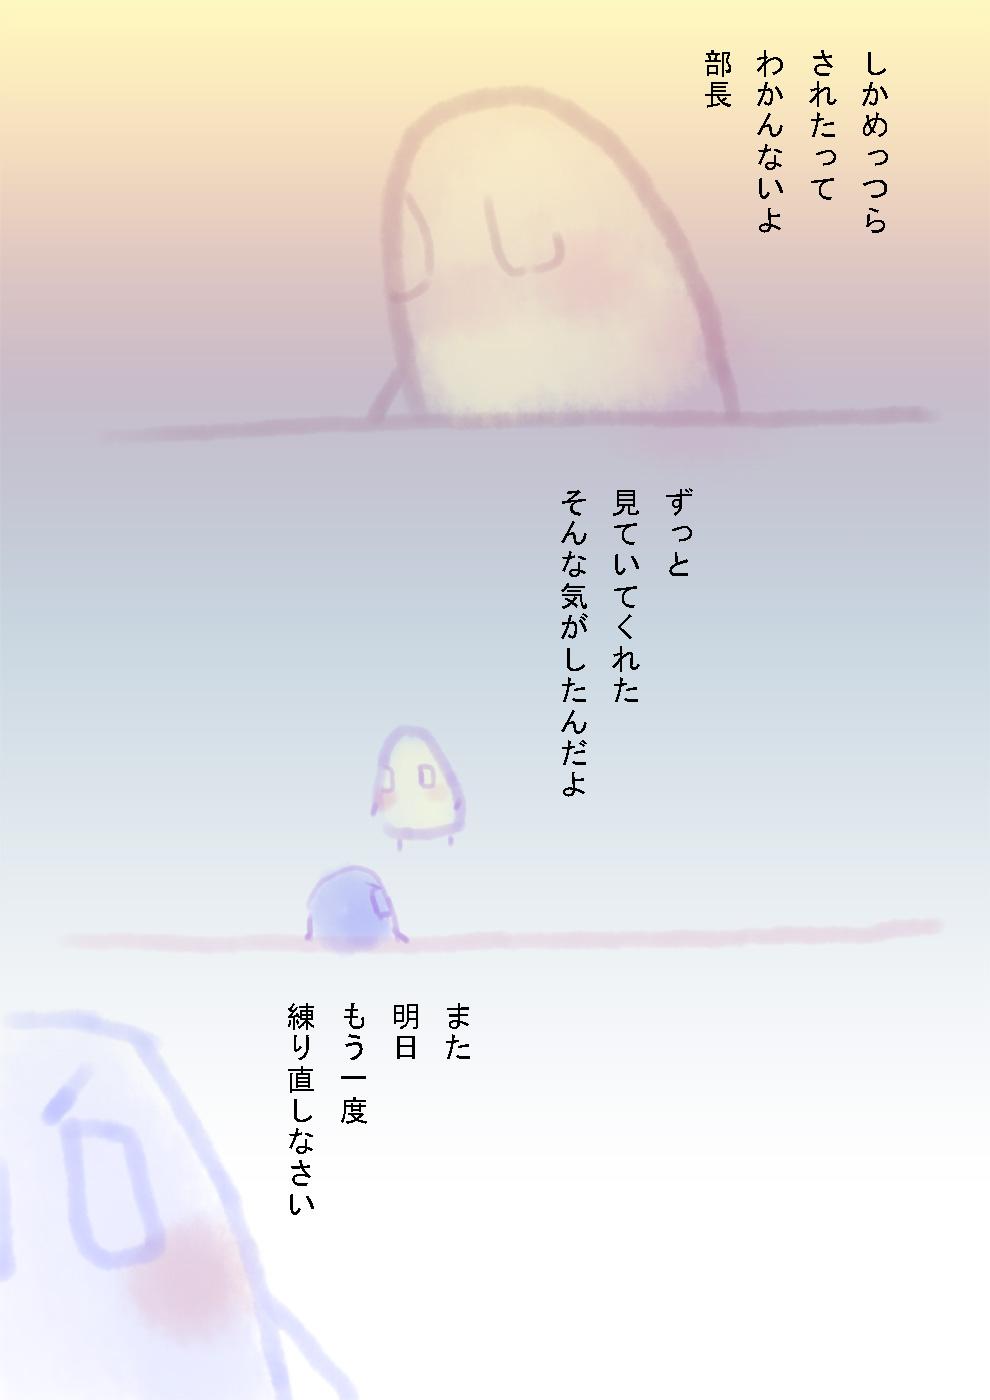 http://ahito.com/comic/short/nega/img/2018/20180604/03.jpg